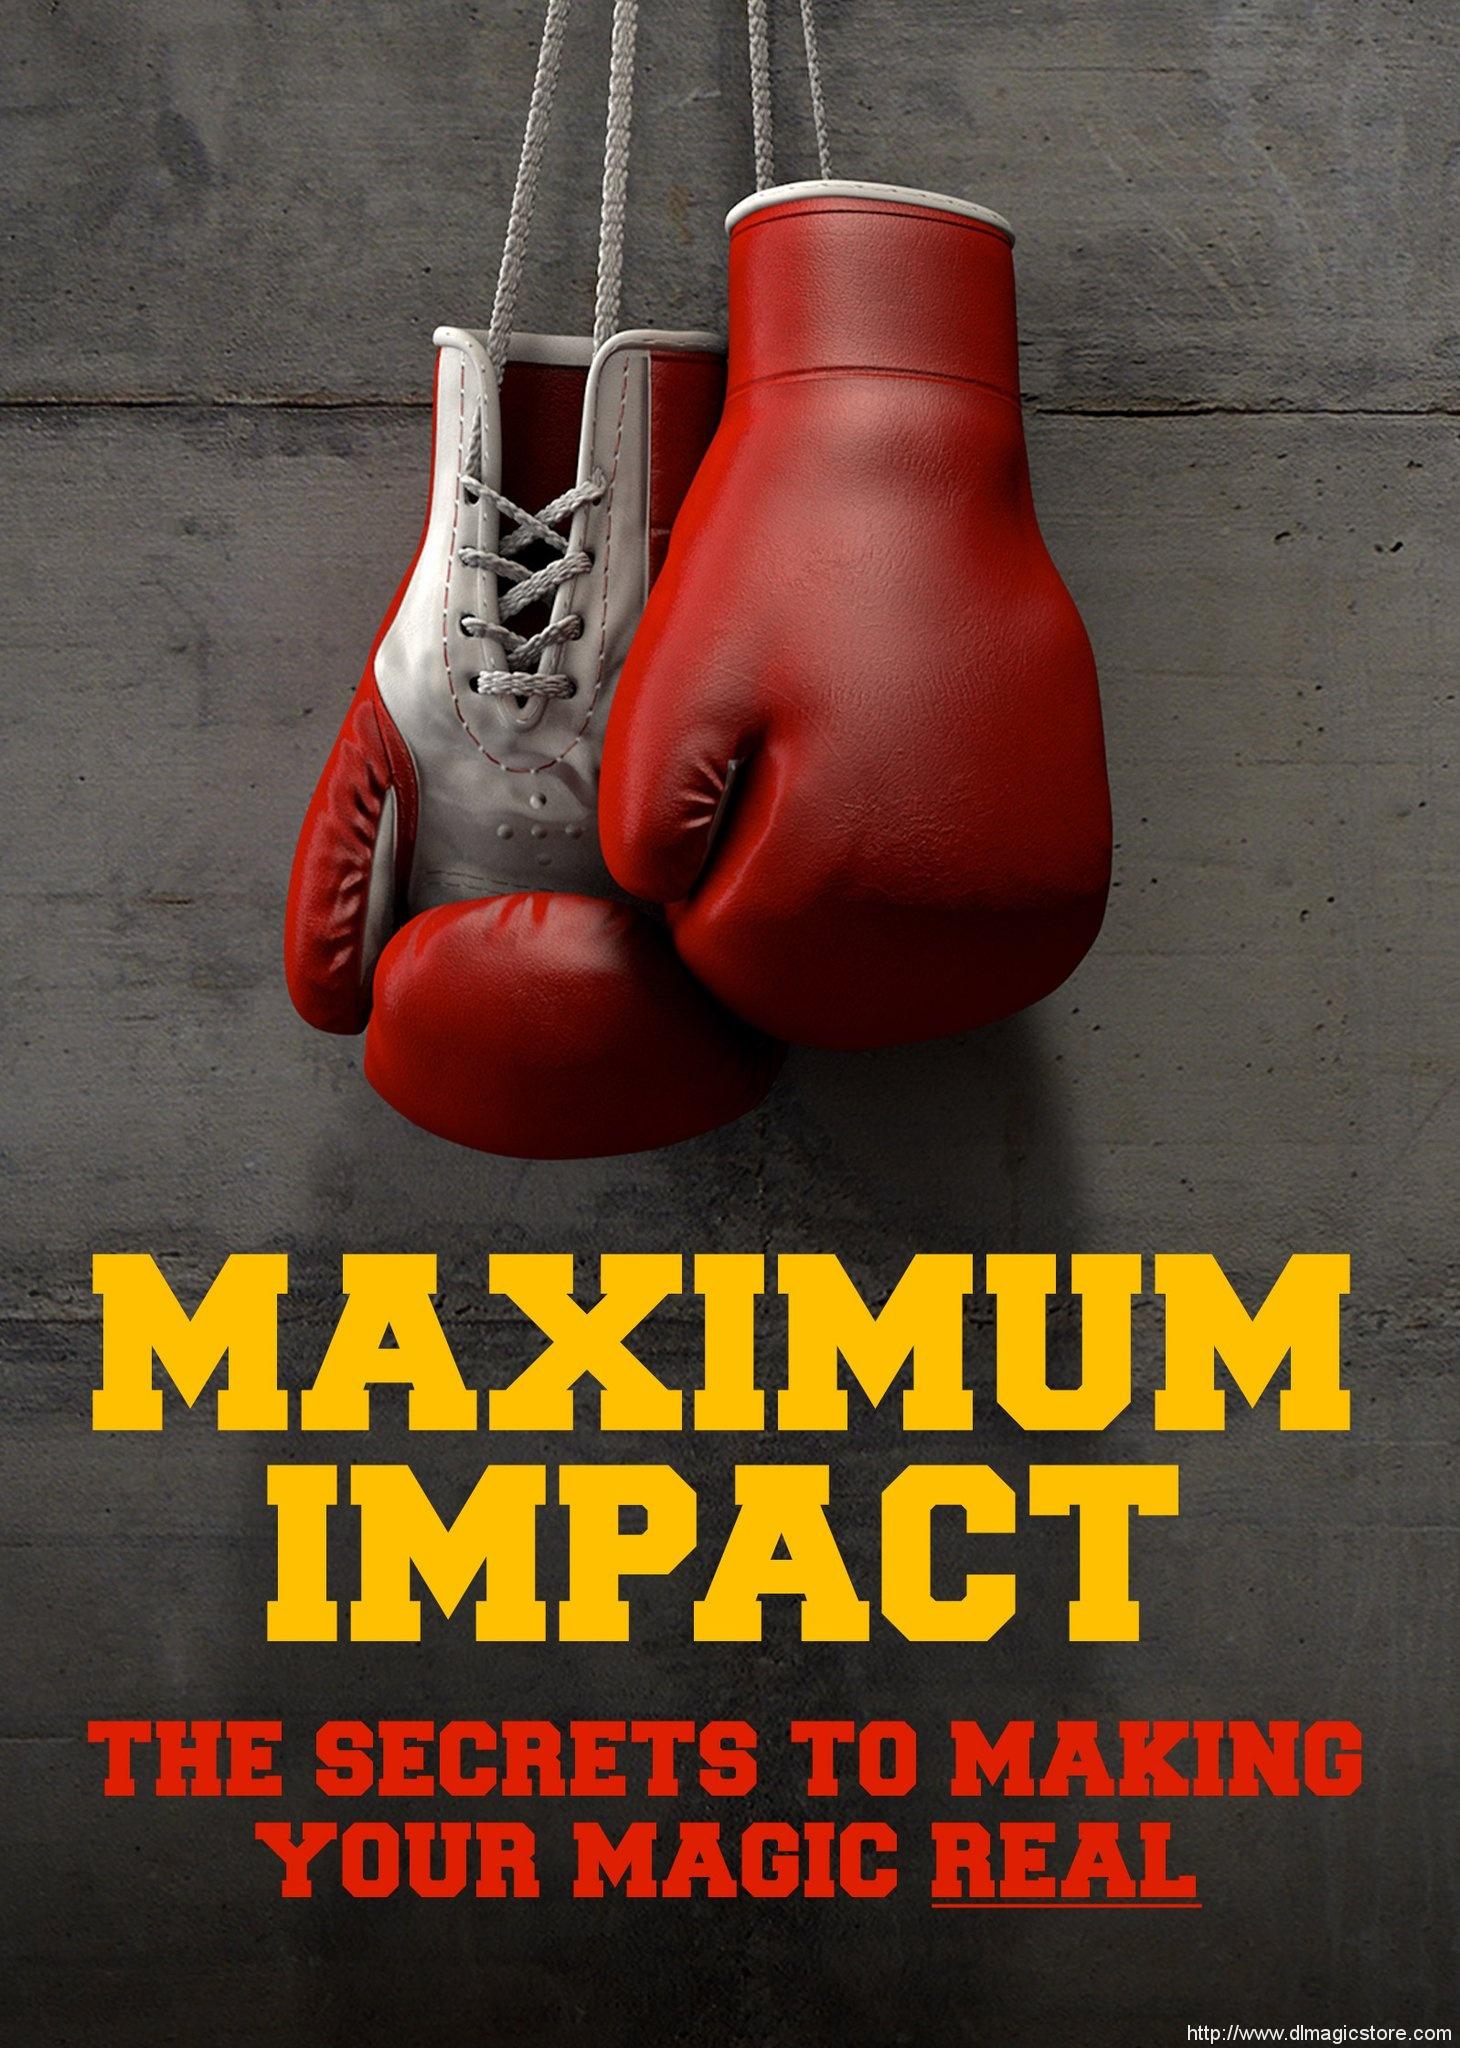 MAXIMUM IMPACT by Jay Sankey